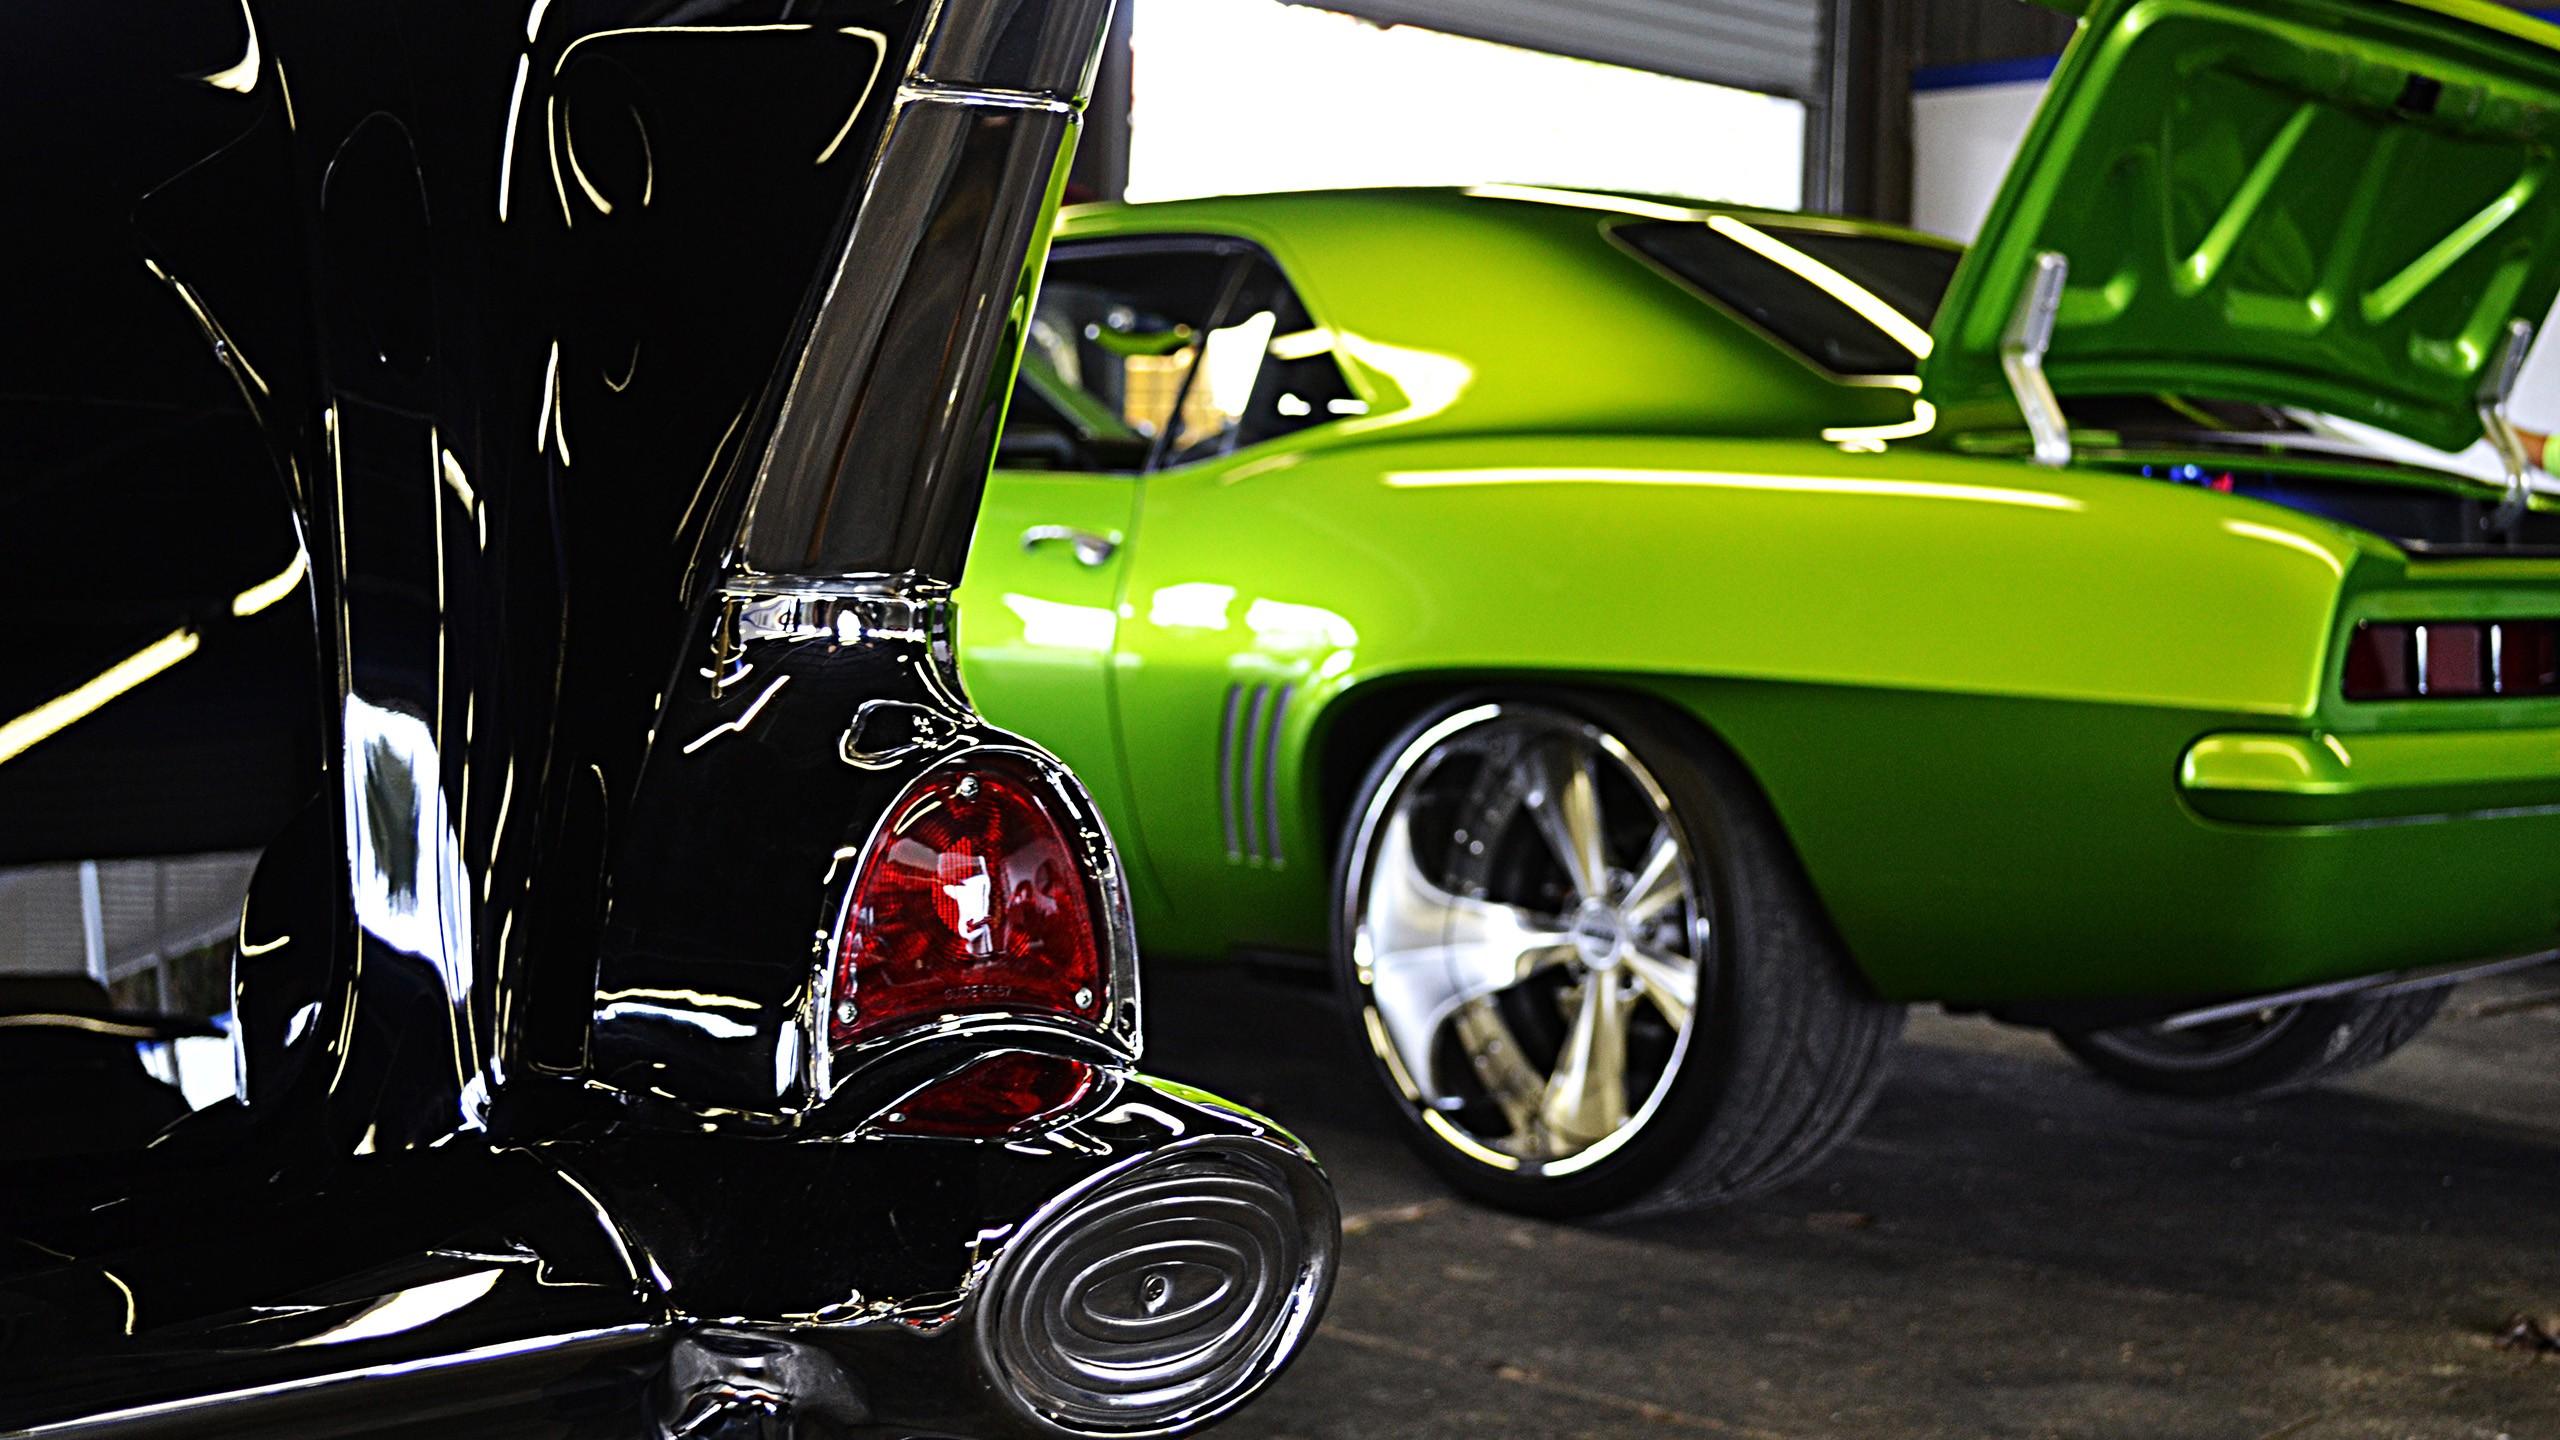 Chevrolet Camaro Hd Wallpaper Background Image 2560x1440 Id